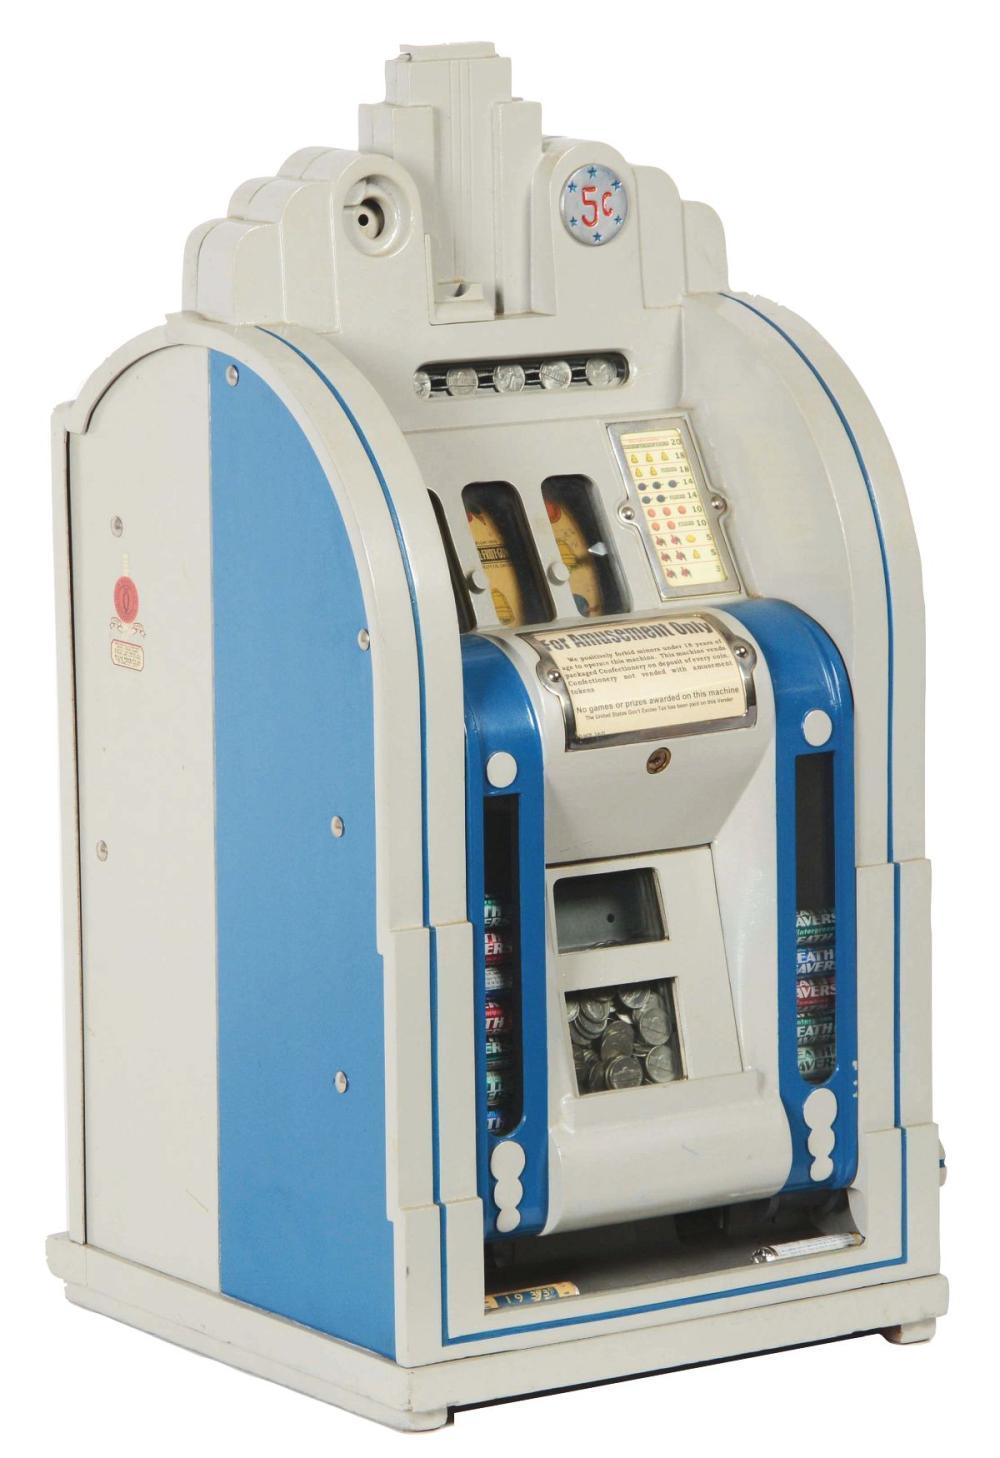 5¢ MILLS VENDER FRONT EXTRAORDINARY SLOT MACHINE.